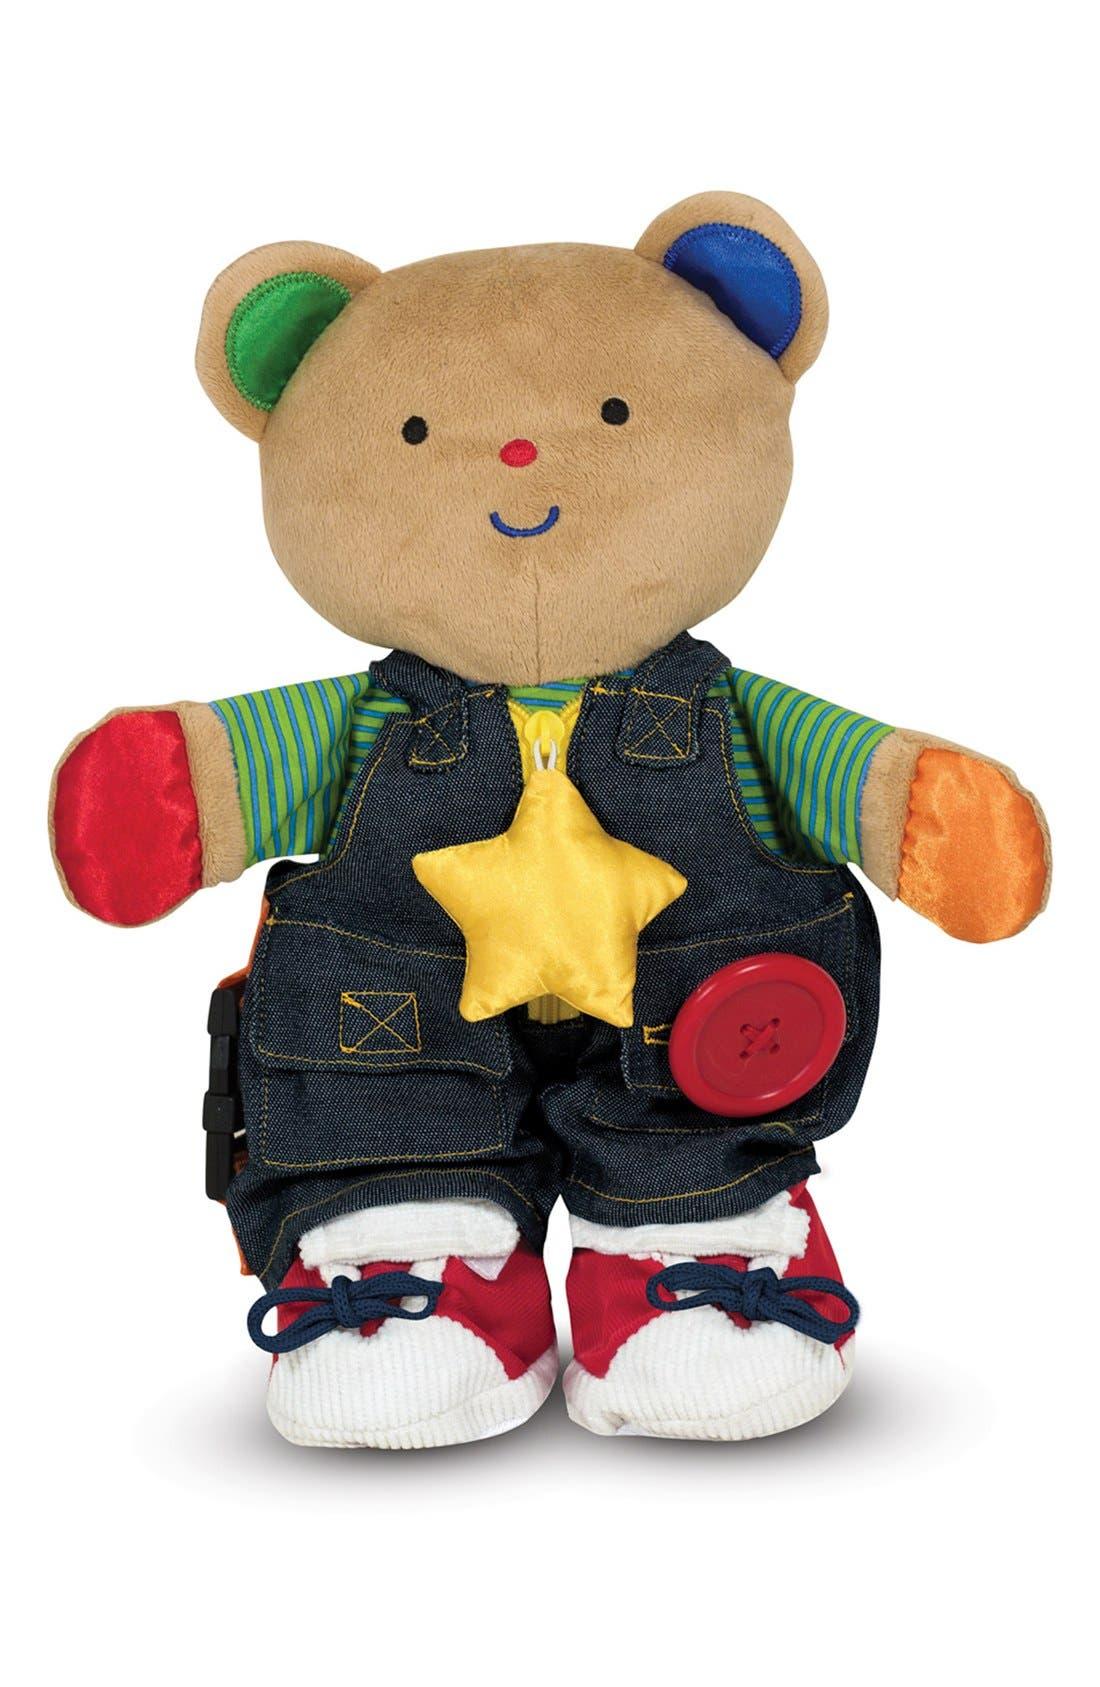 Alternate Image 1 Selected - Melissa & Doug 'Teddy Wear' Plush Toy